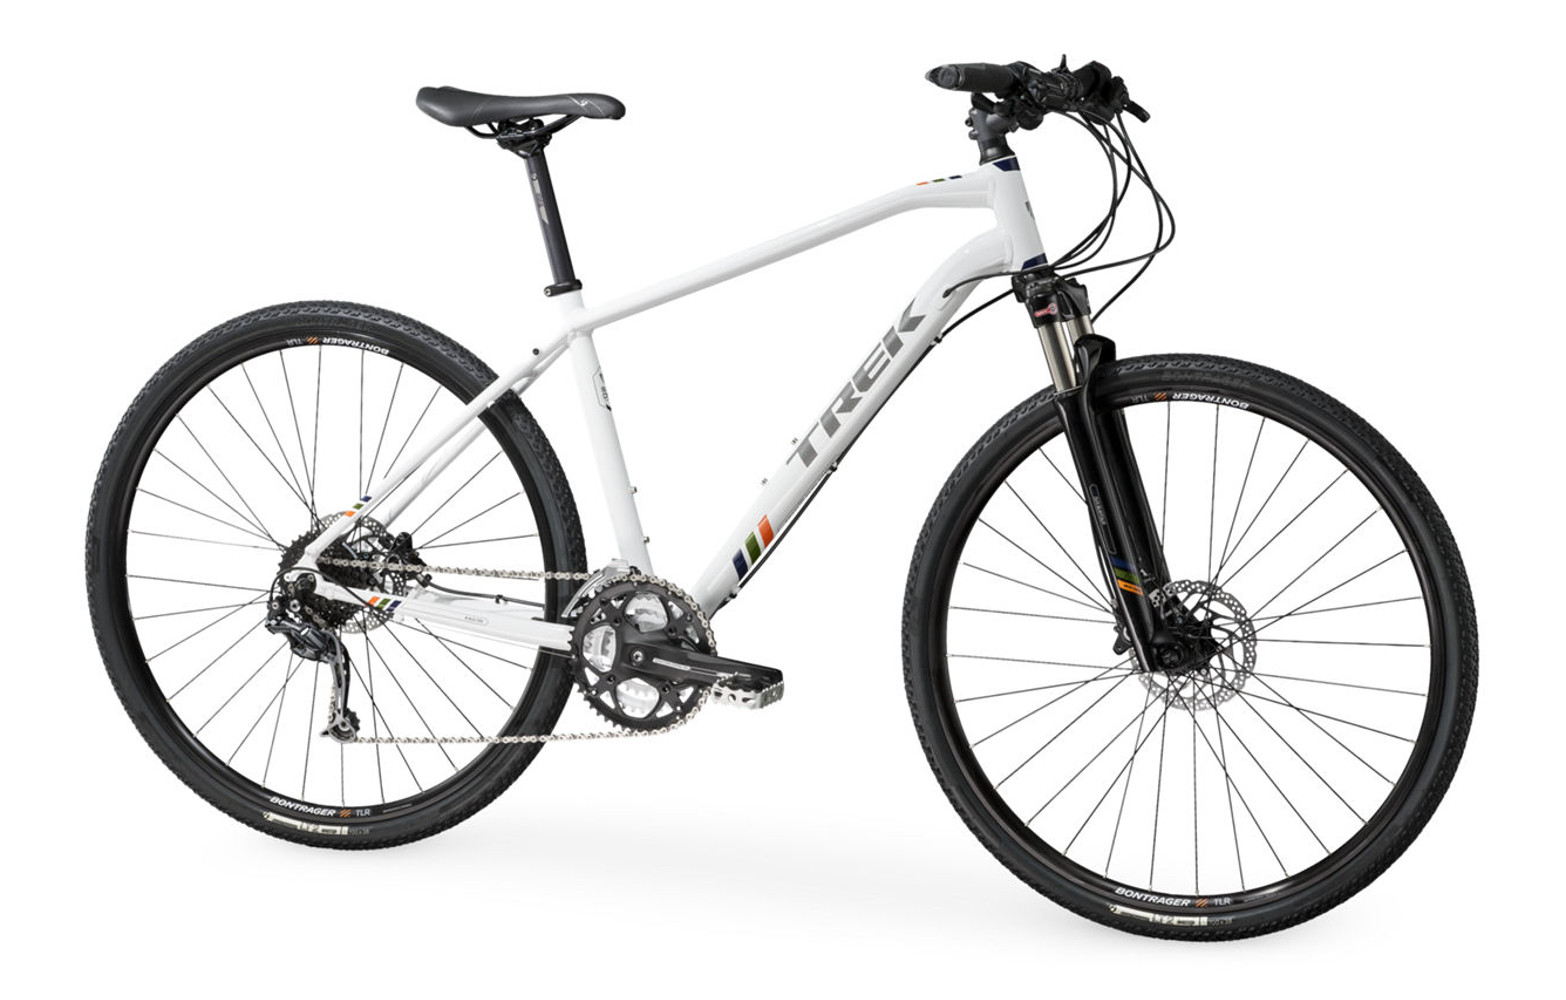 trek 8 5 ds hybrid bike white 2016. Black Bedroom Furniture Sets. Home Design Ideas